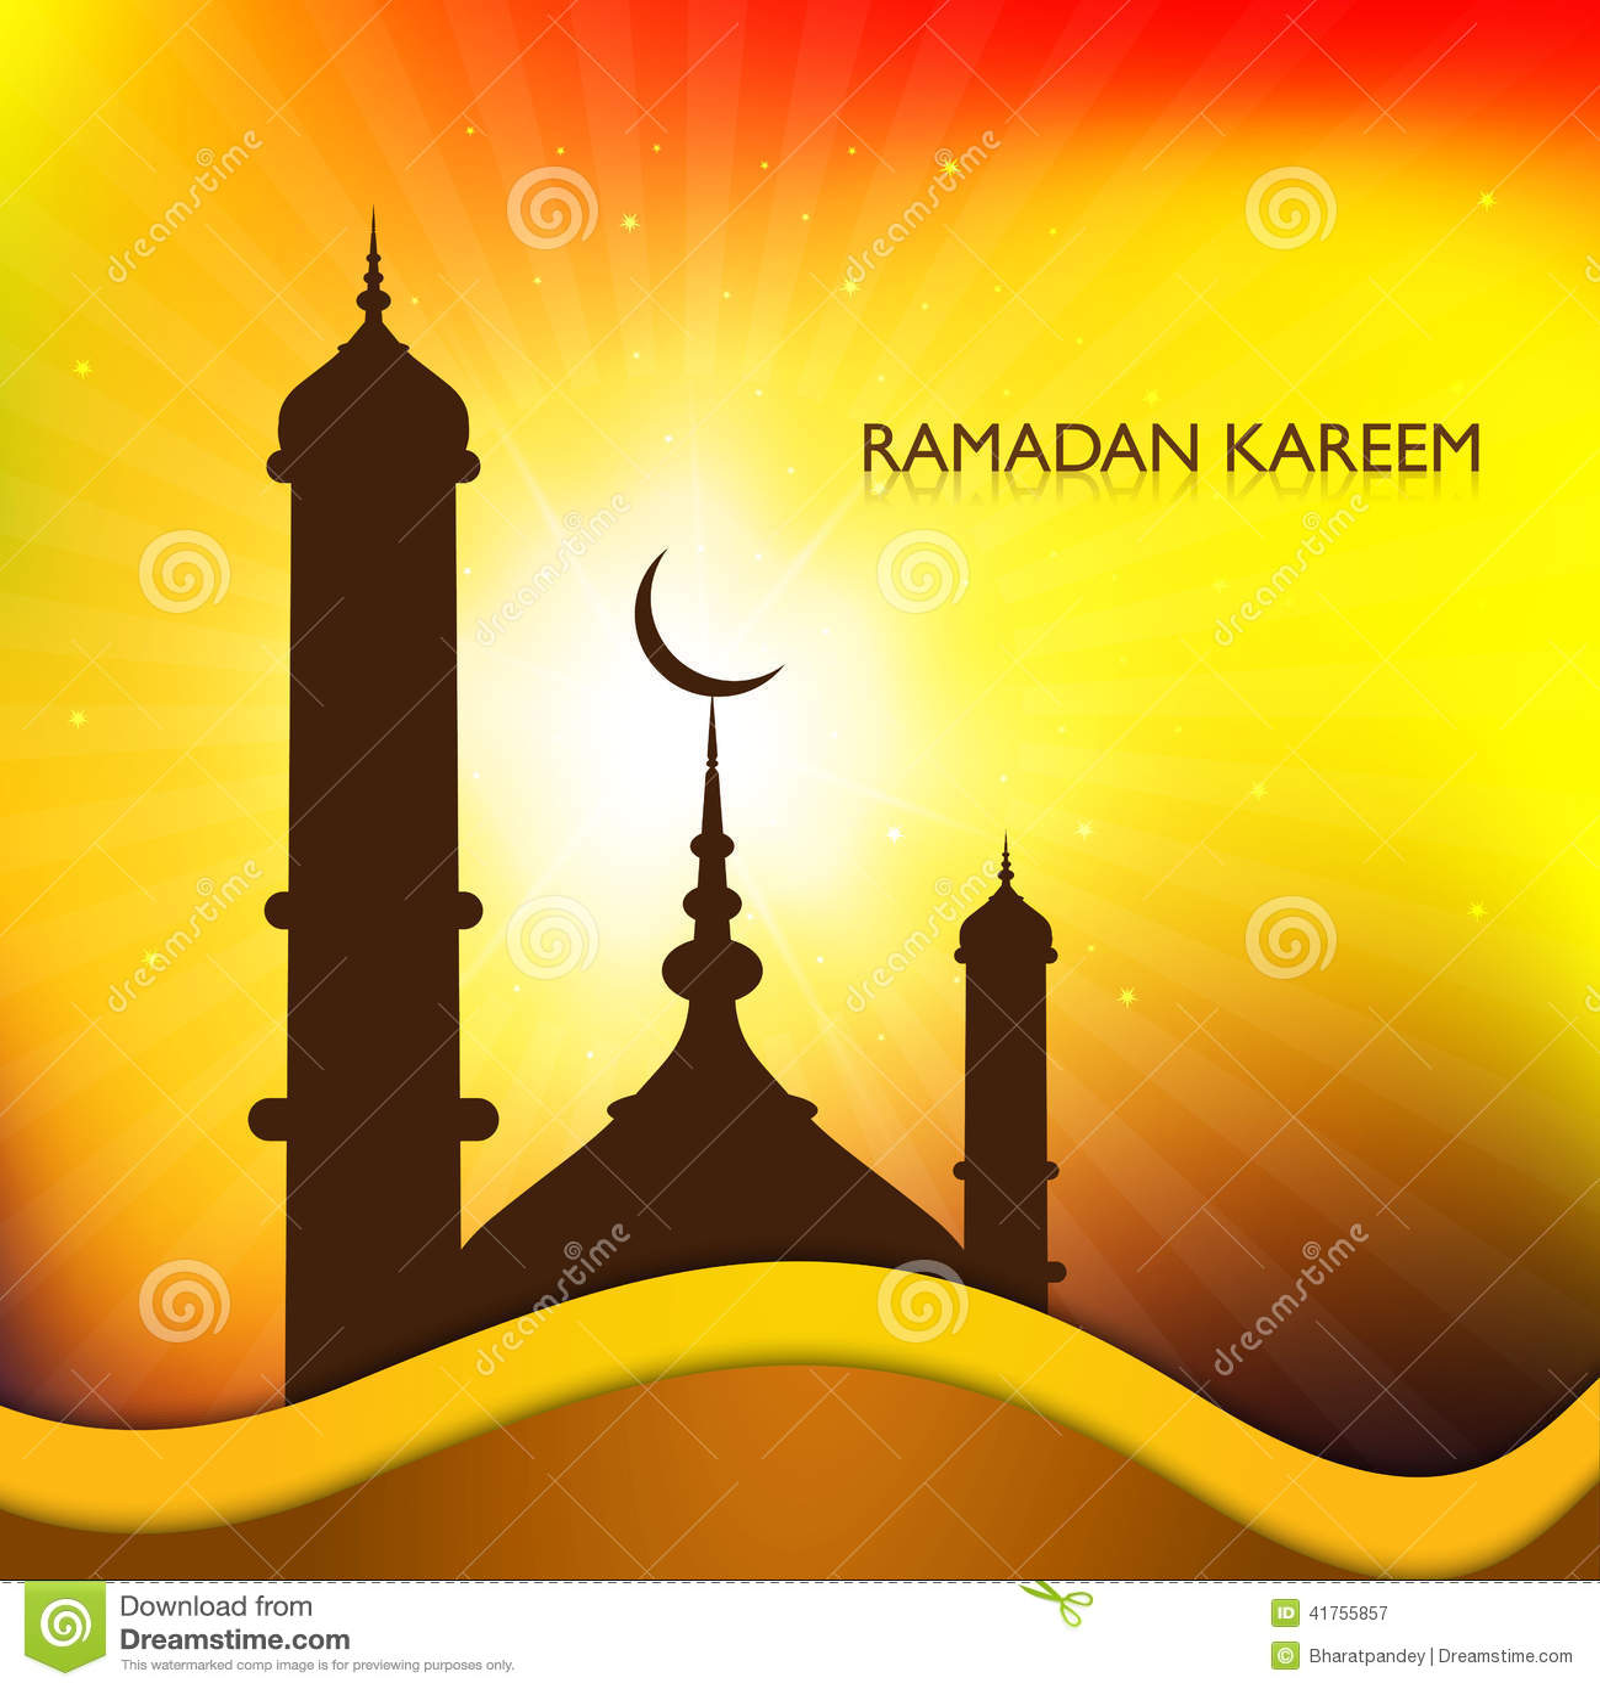 Mosque background for ramadan kareem stock photography image - Ramadan Kareem Mosque Card For Religious Royalty Free Stock Photography